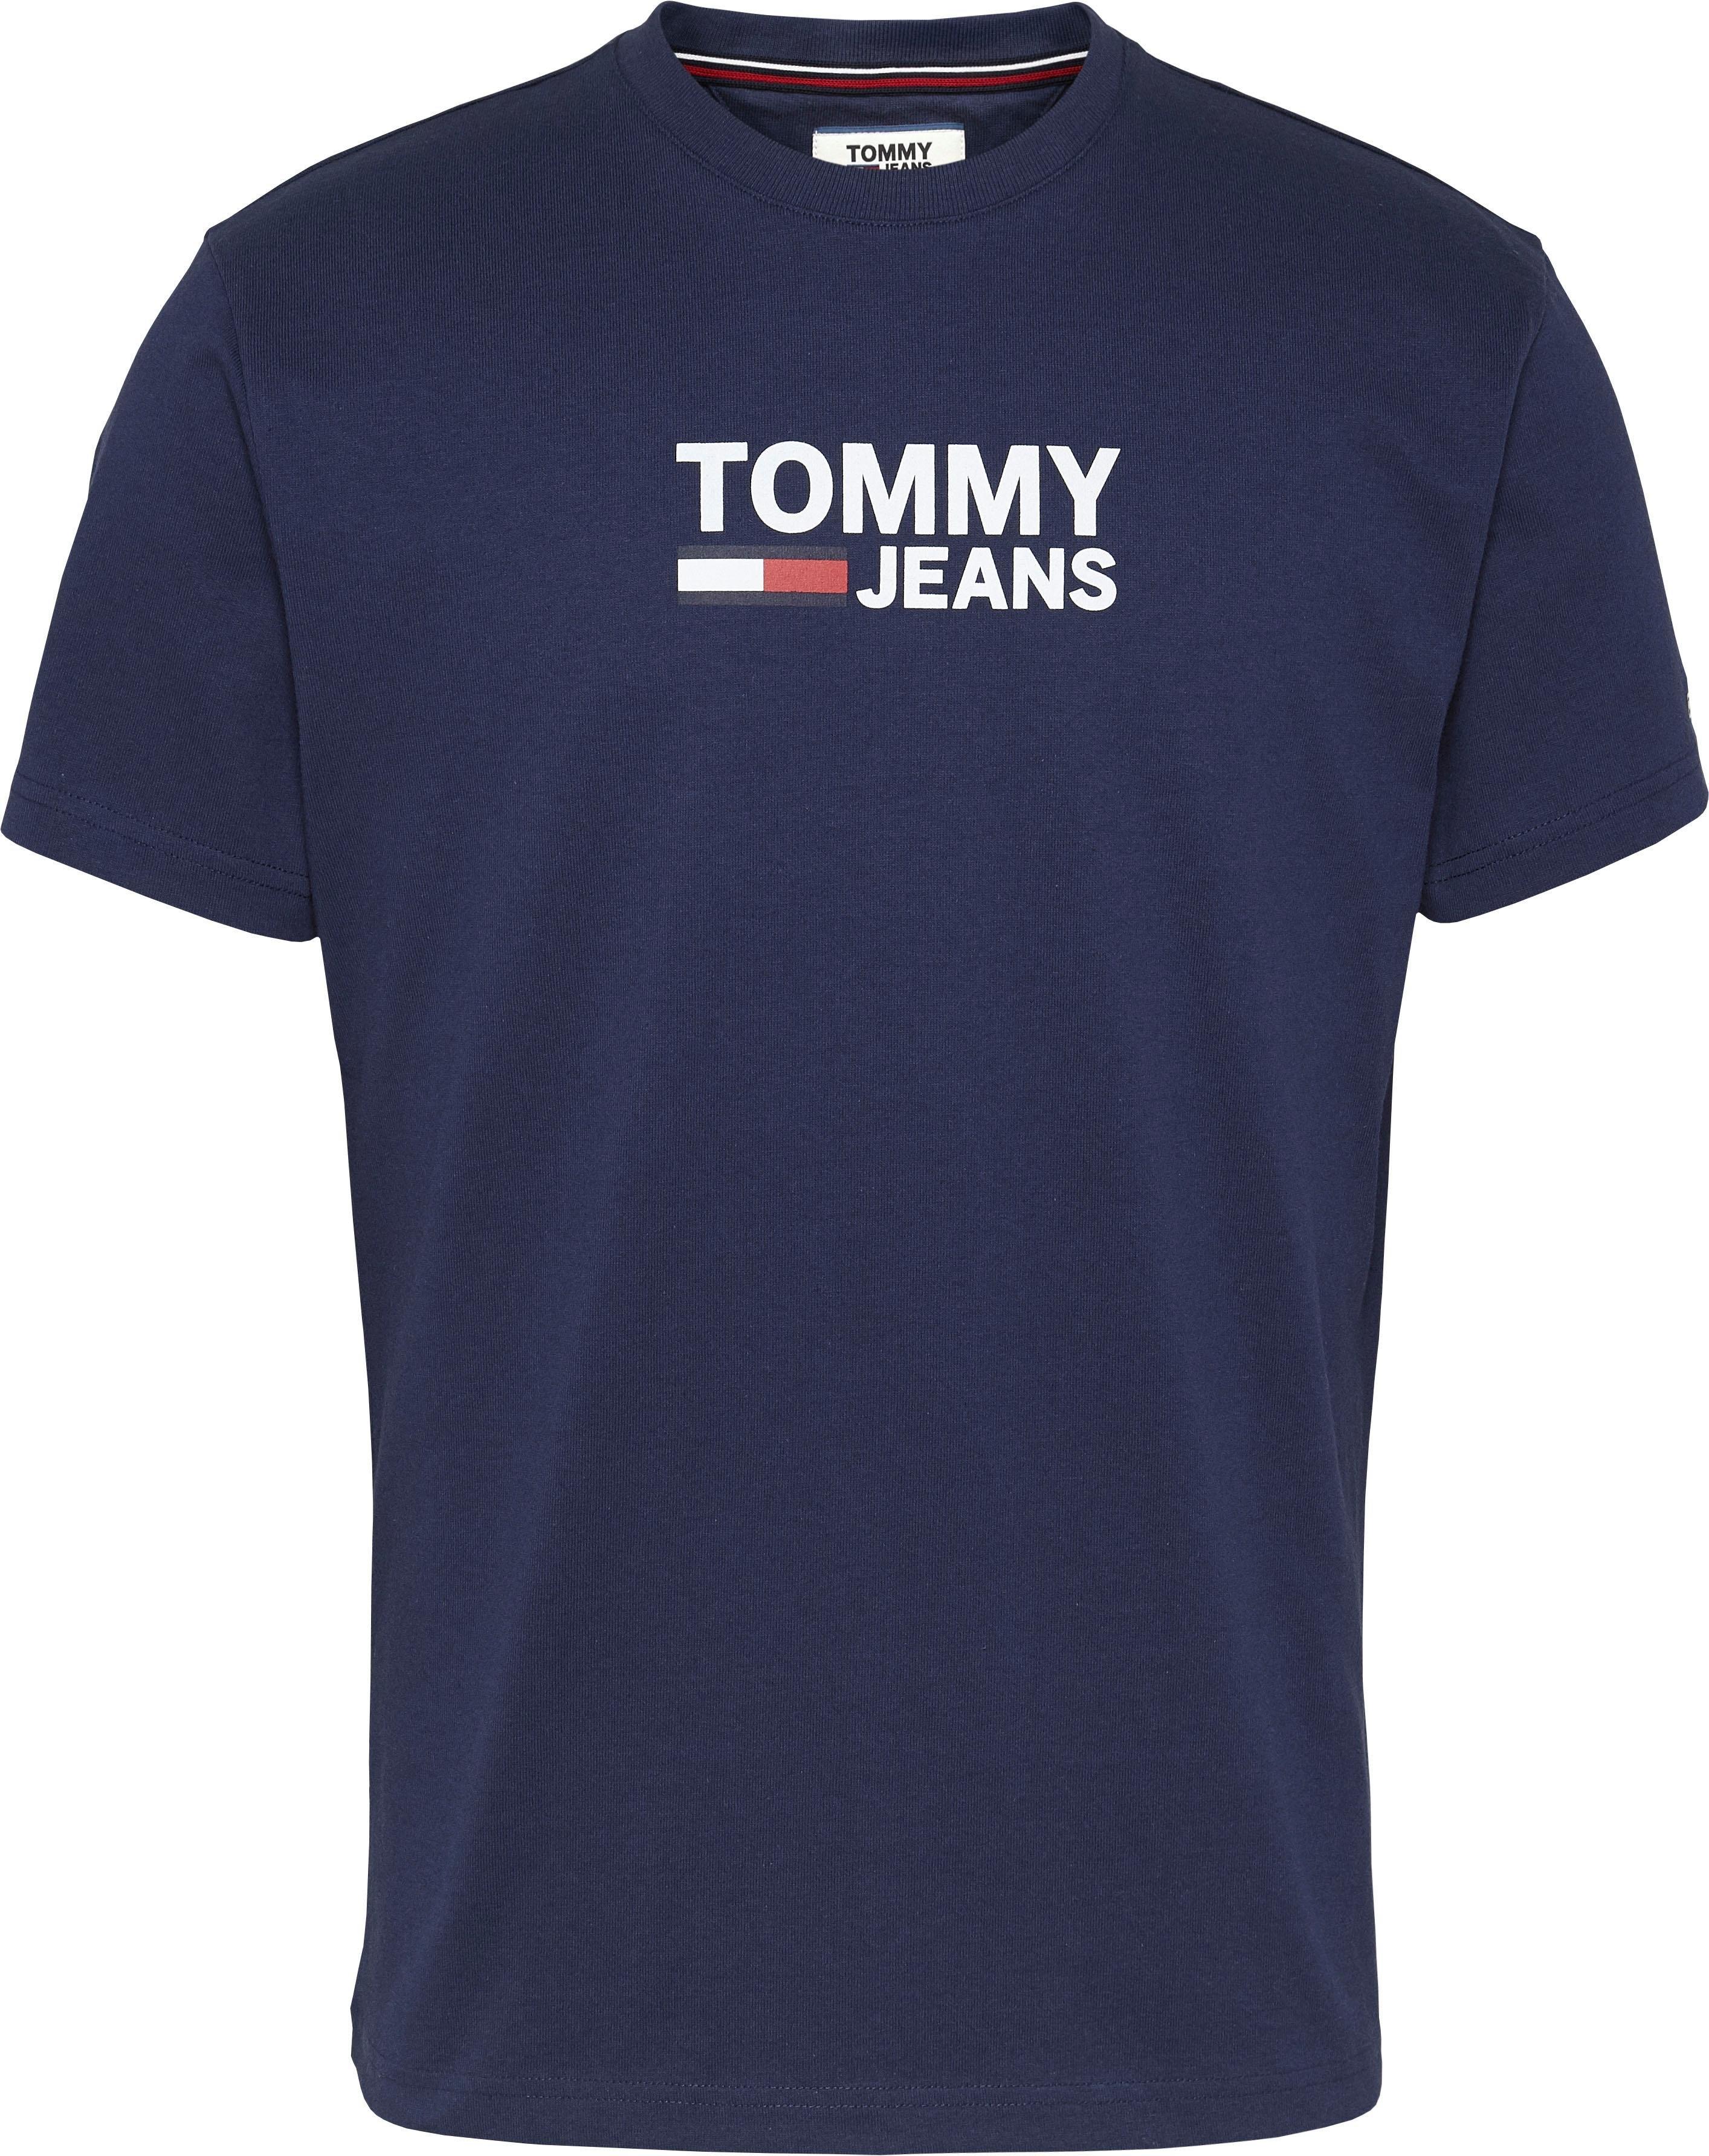 Tommy Jeans T-shirt »TJM TOMMY CLASSICS LOGO TEE« nu online kopen bij OTTO